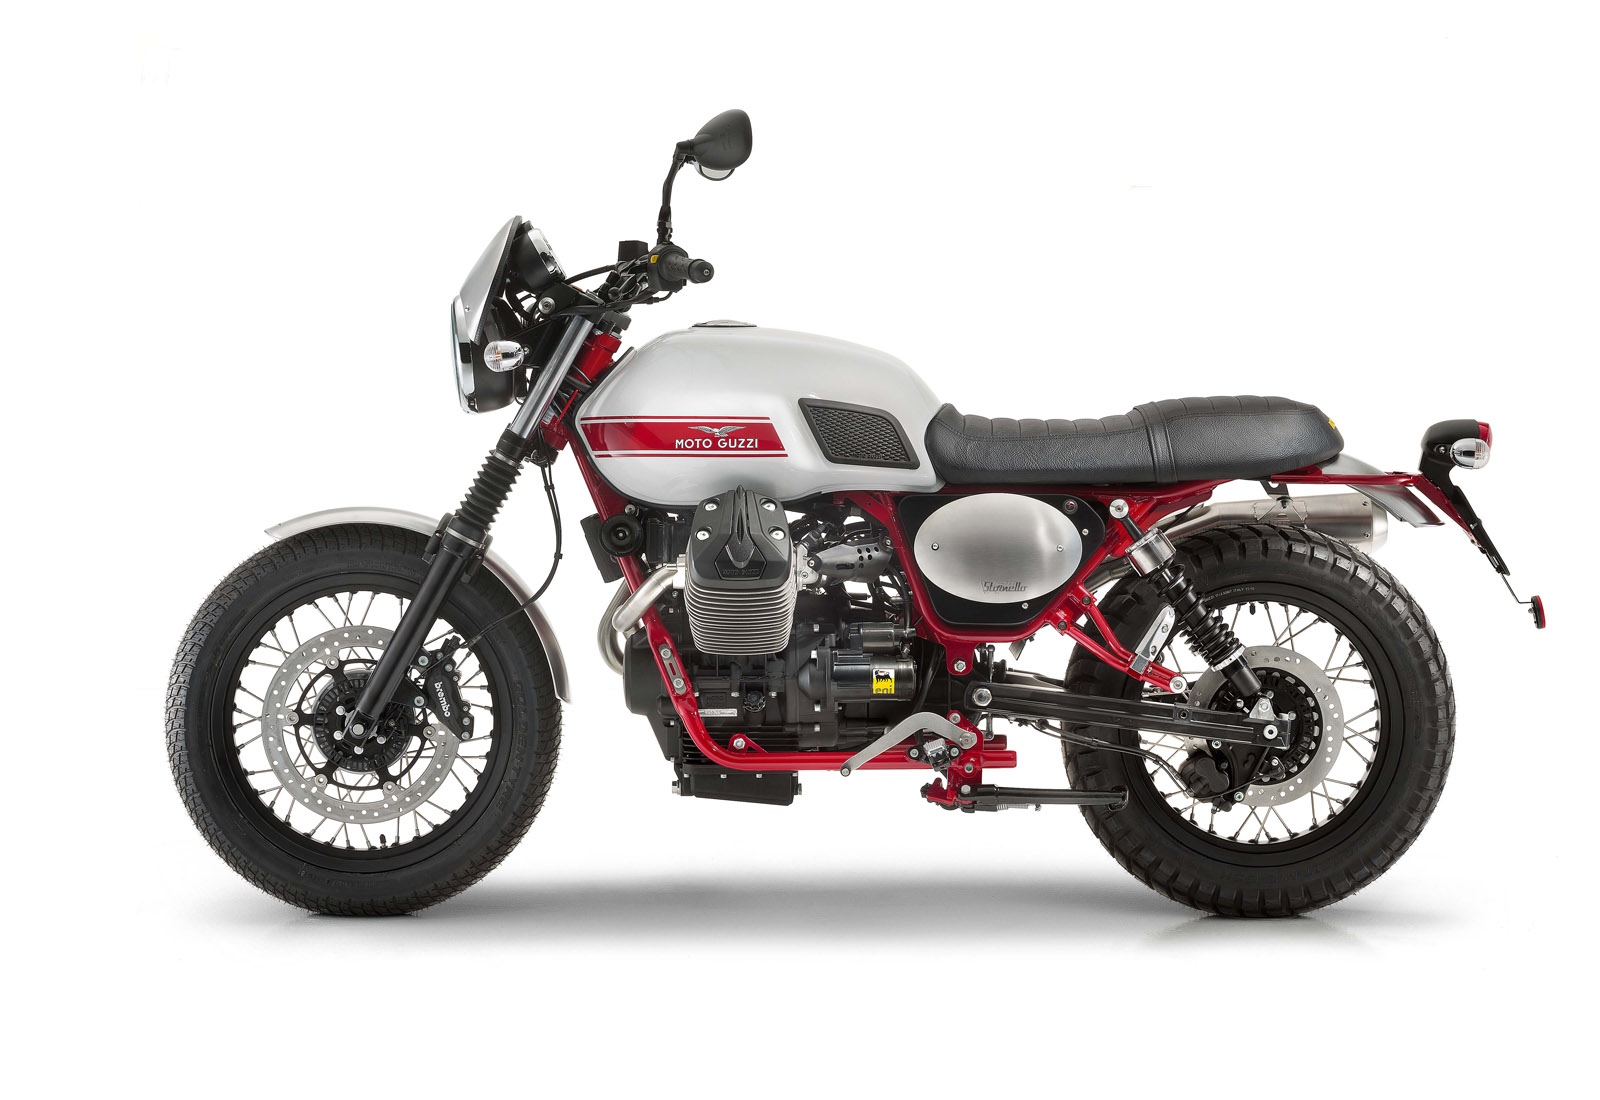 Moto de perfil, modelo Stornello, color gris con detalles en rojo. Marca Motoguzzi